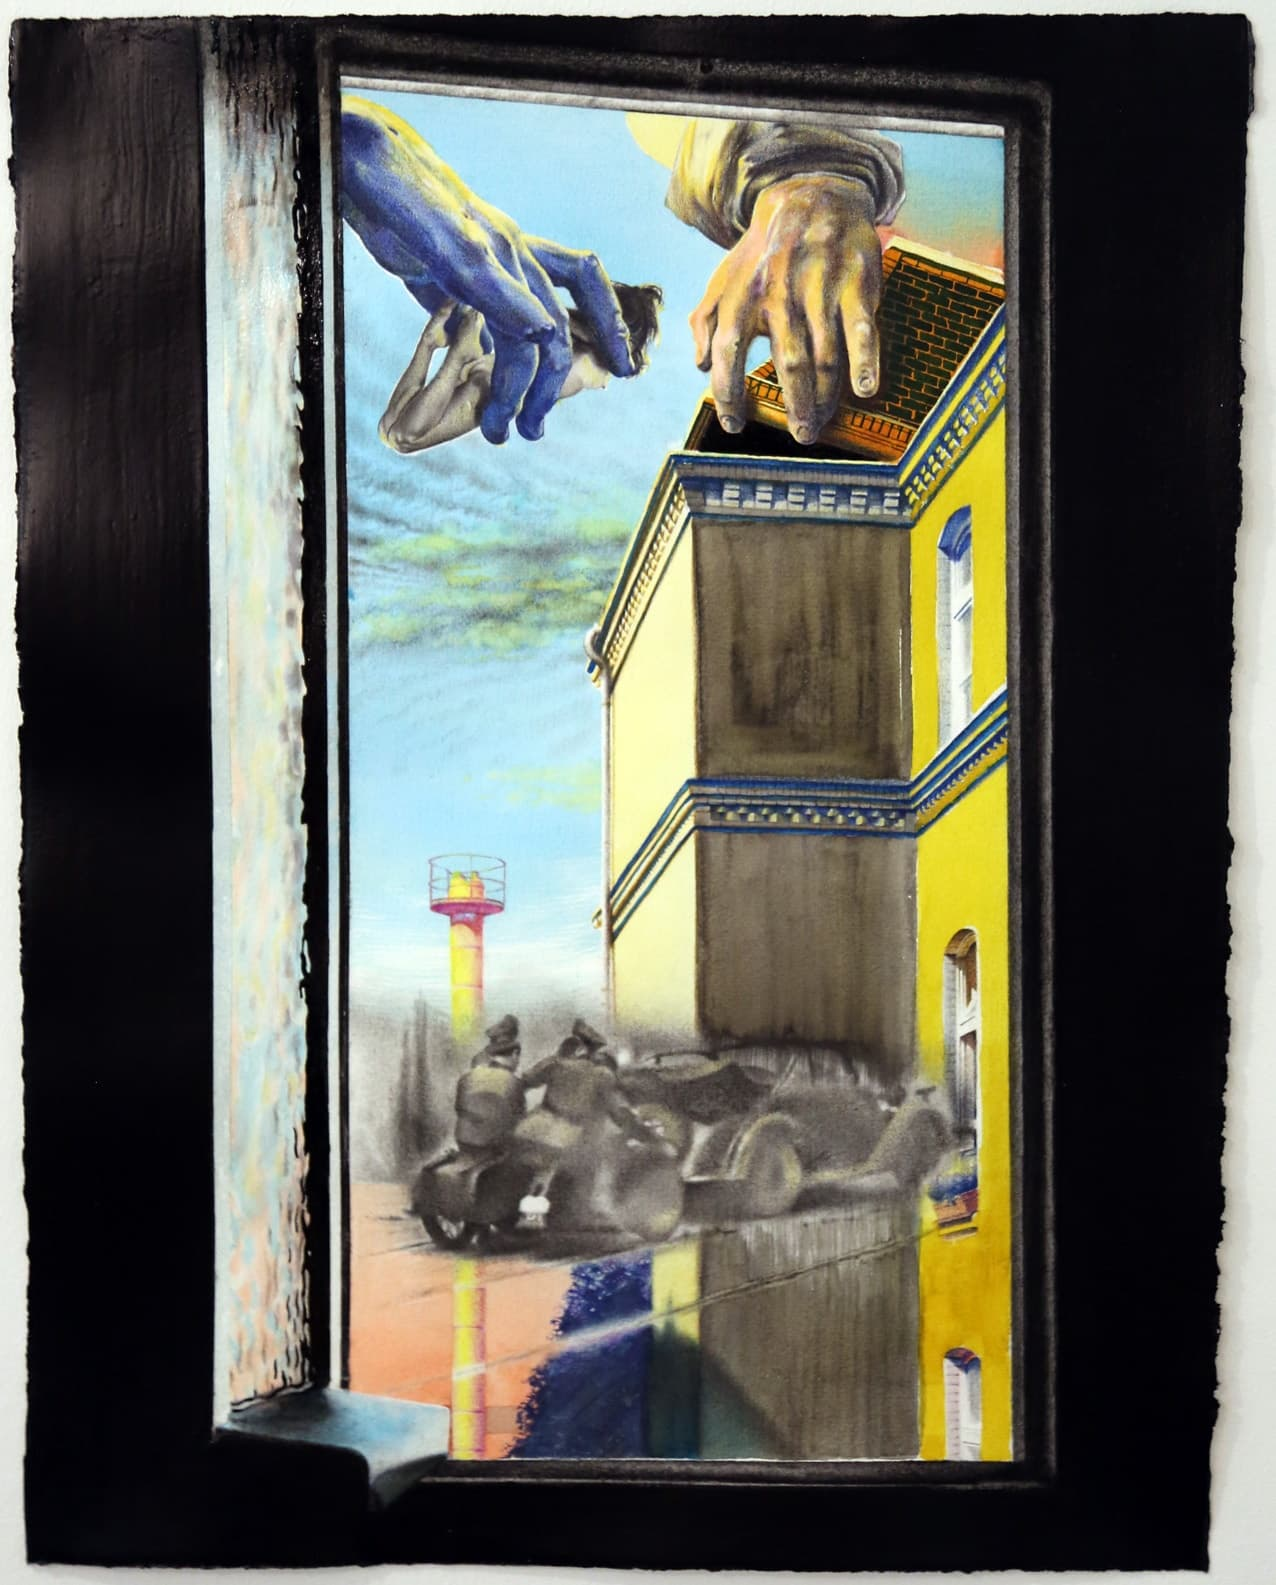 <span class=&#34;link fancybox-details-link&#34;><a href=&#34;/exhibitions/98/works/image2079/&#34;>View Detail Page</a></span><div id=&#34;artwork-panel-details&#34; class=&#34;standard-artwork-details&#34;><div class=&#34;artist&#34;><strong>Robert McNally</strong></div><div class=&#34;title&#34;><em>Poll tax. grab&#8217;em by the P</em>, 2017</div><div class=&#34;medium&#34;>Graphite pencil, watercolour, enamel paint & rubber flies on paper</div><div class=&#34;dimensions&#34;>68 x 53 cm<br /> 26 3/4 x 20 7/8 in</div></div>